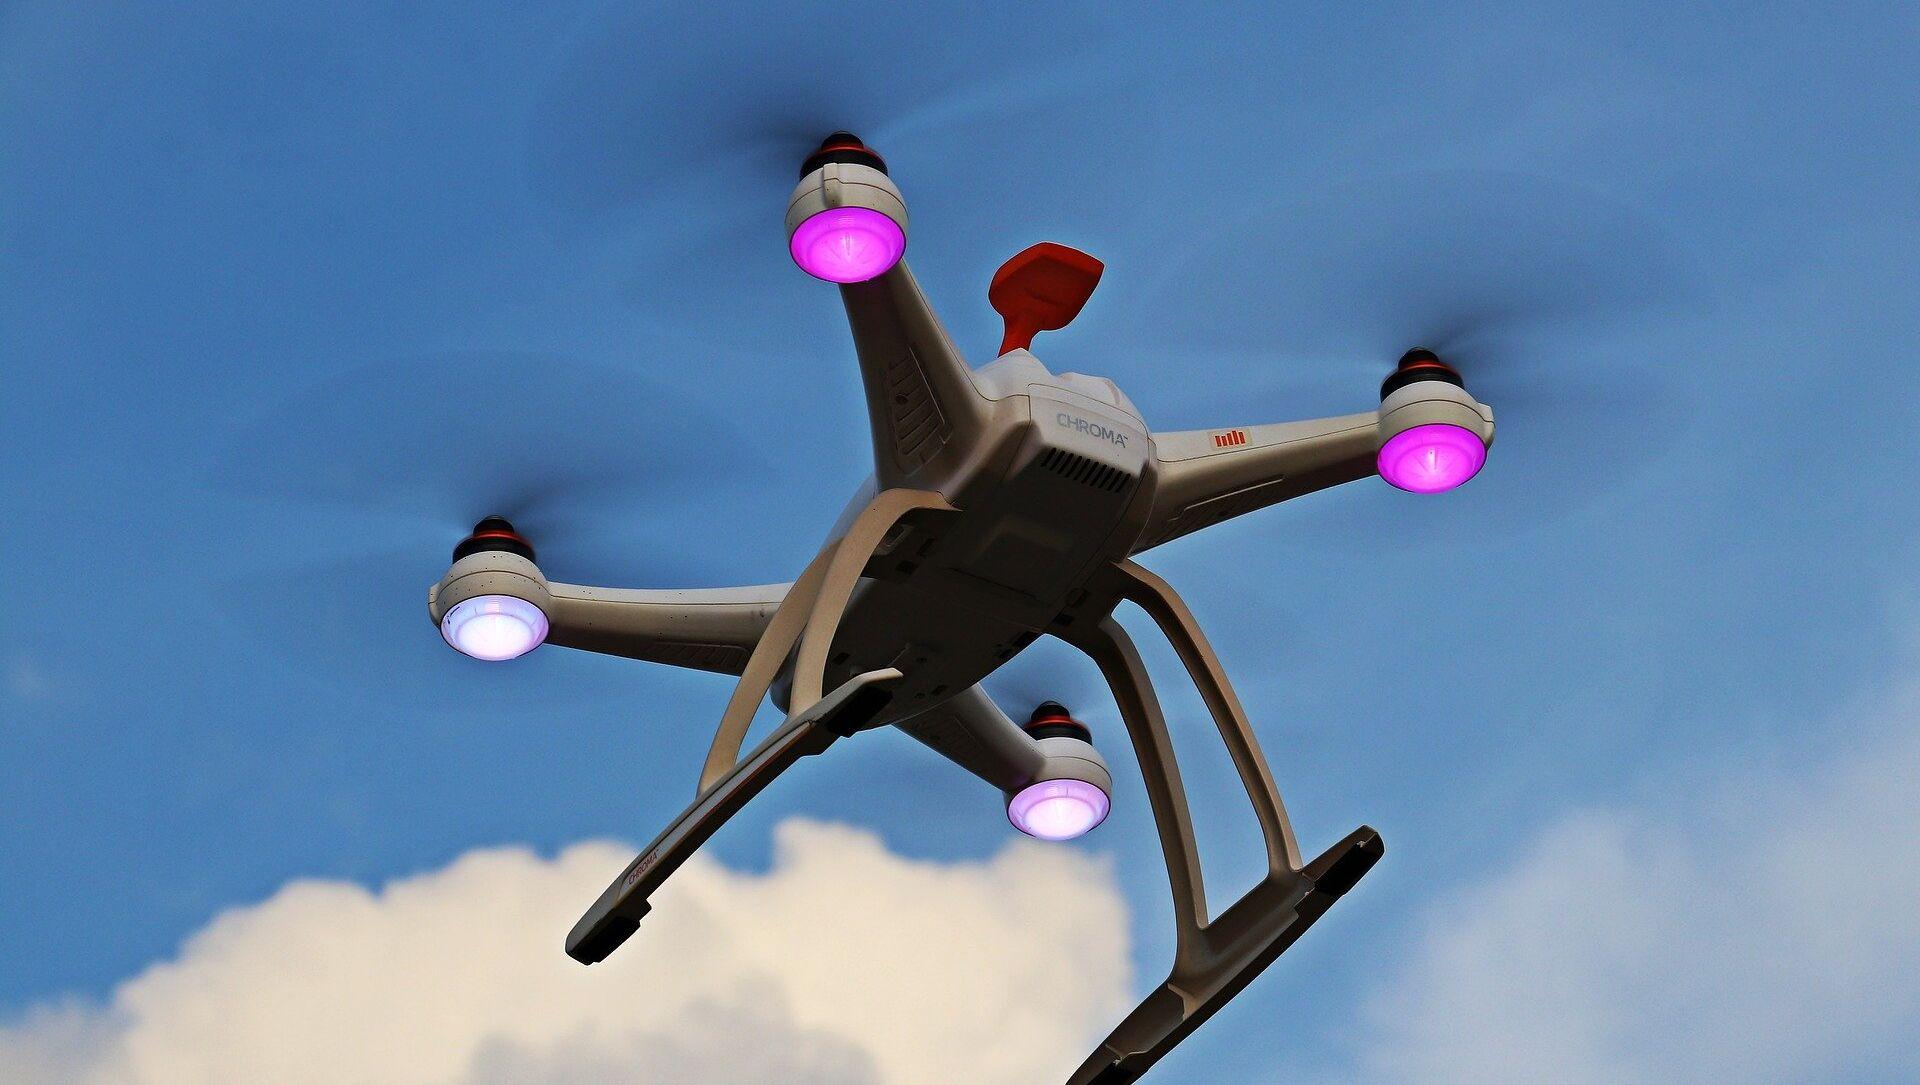 Drones. - Sputnik International, 1920, 26.07.2021